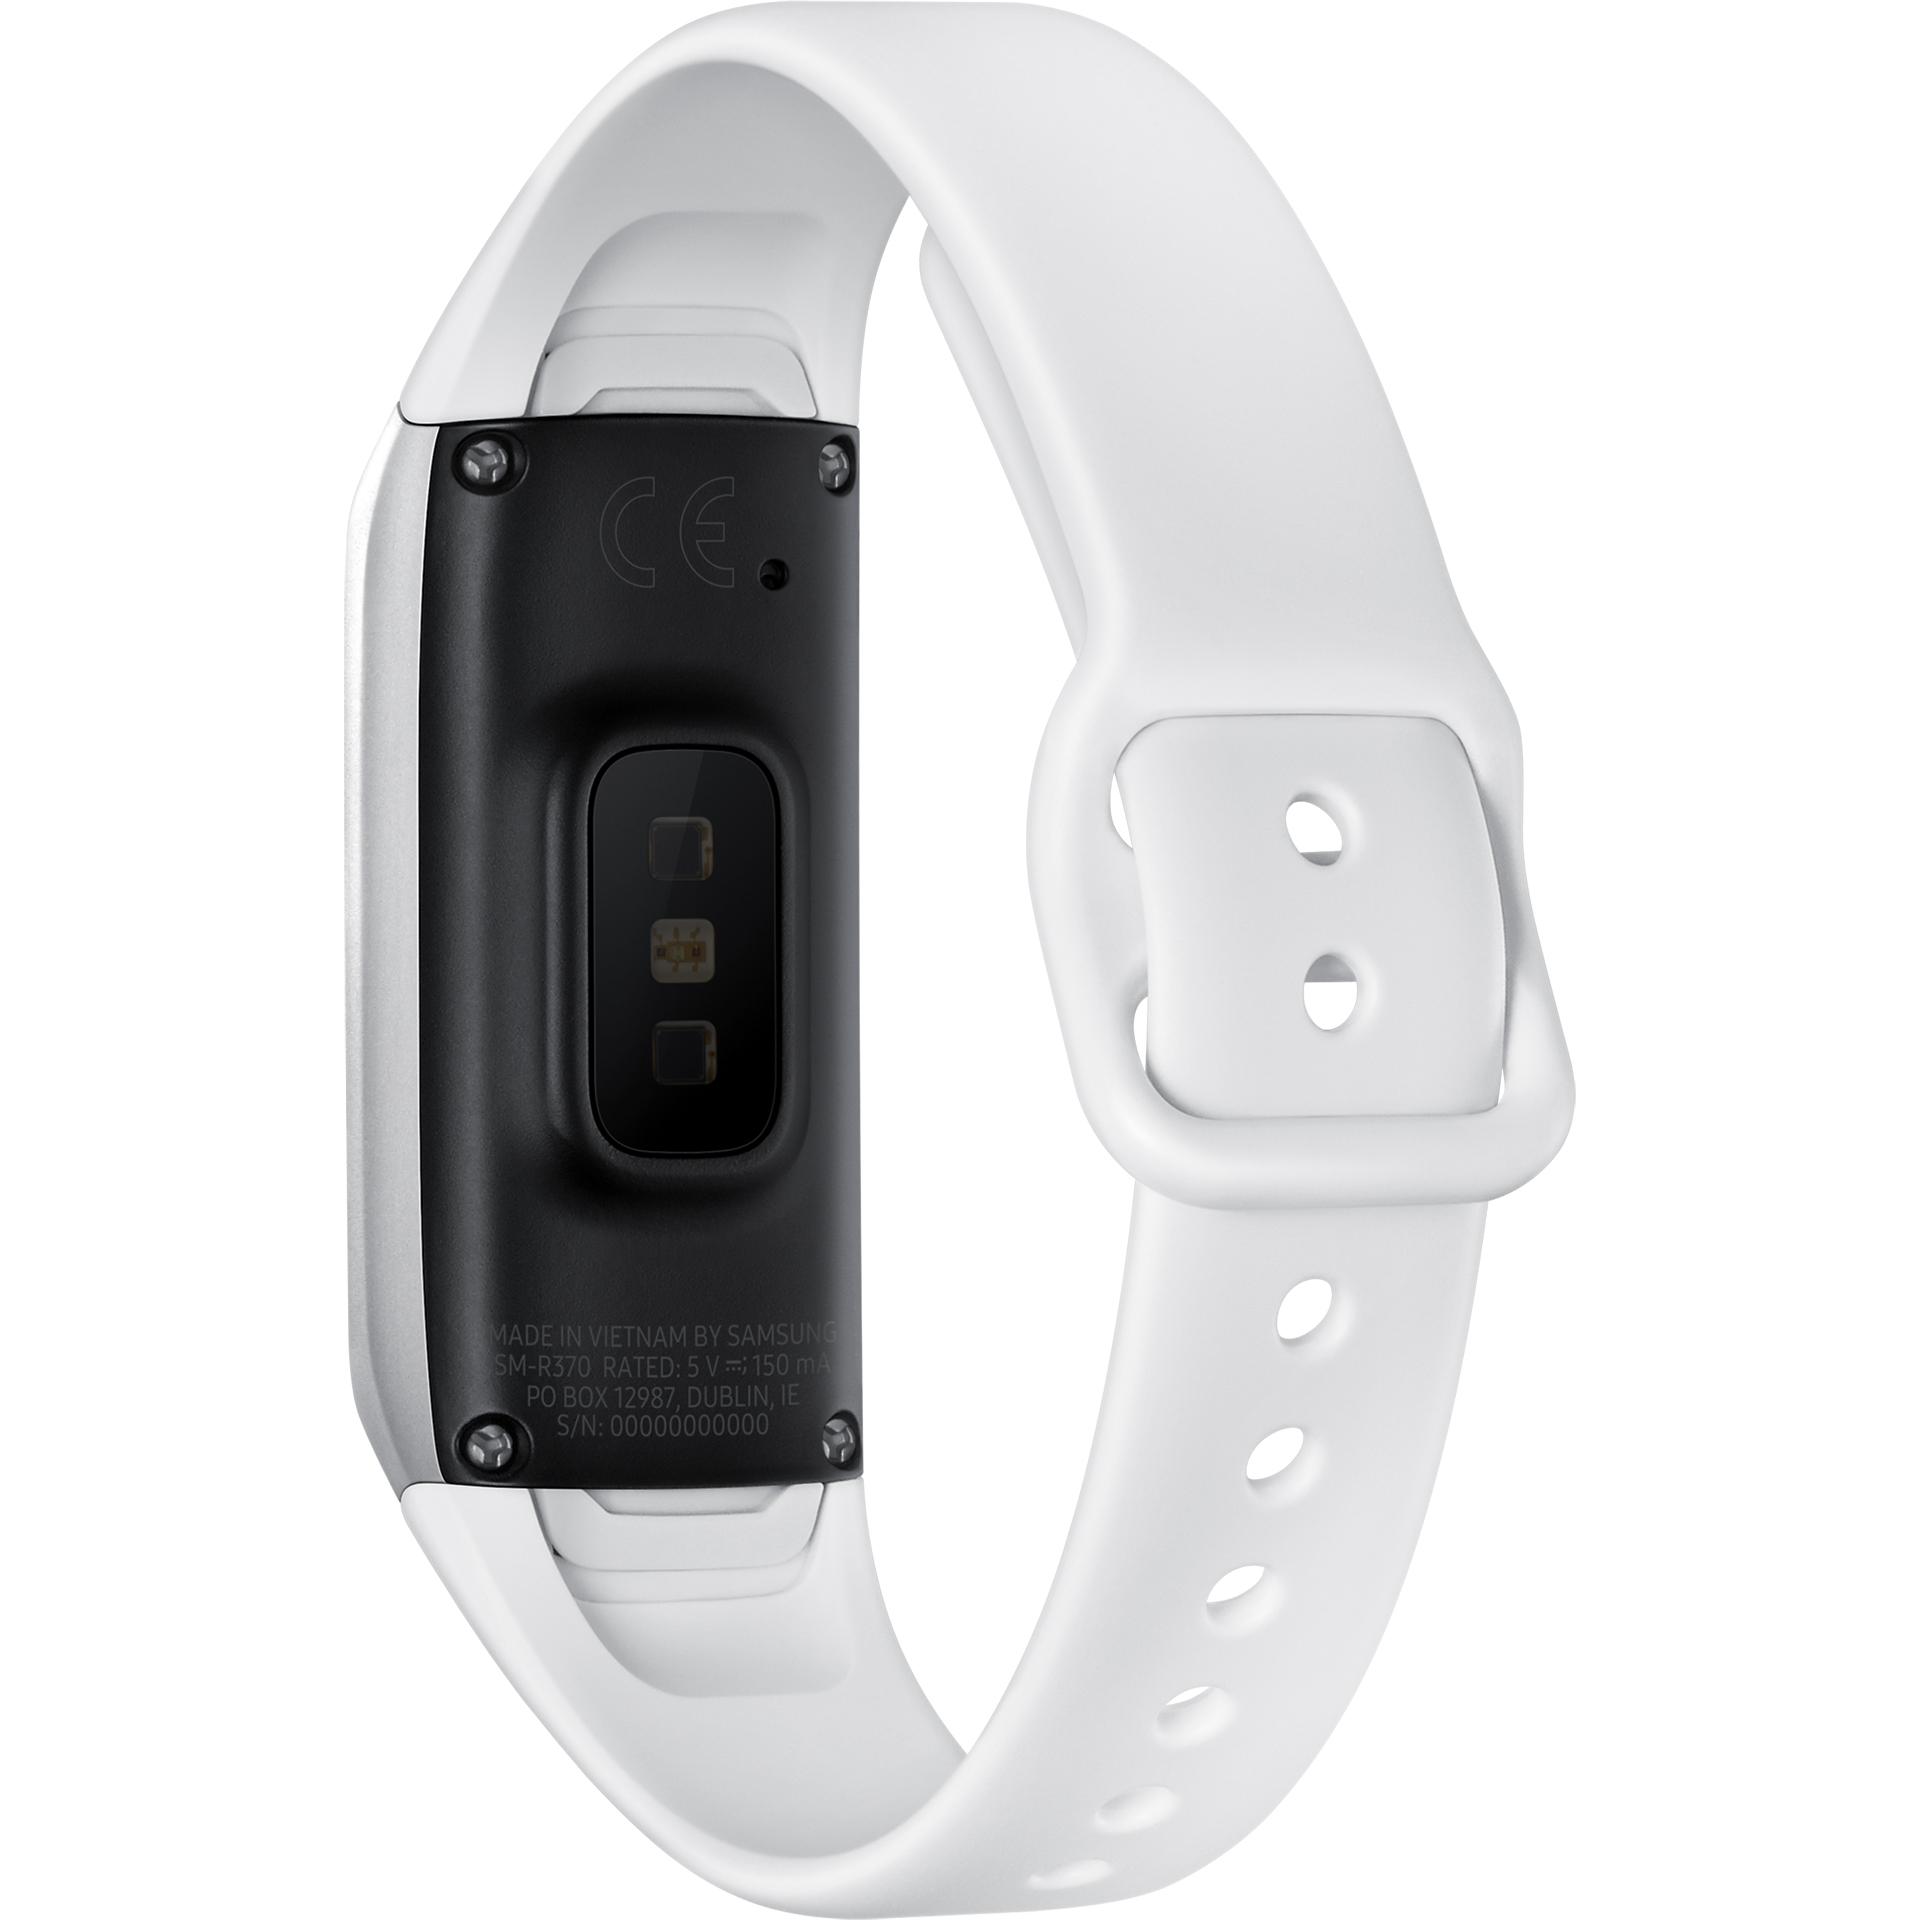 aktiivsusmonitor Samsung Galaxy Fit (valge)